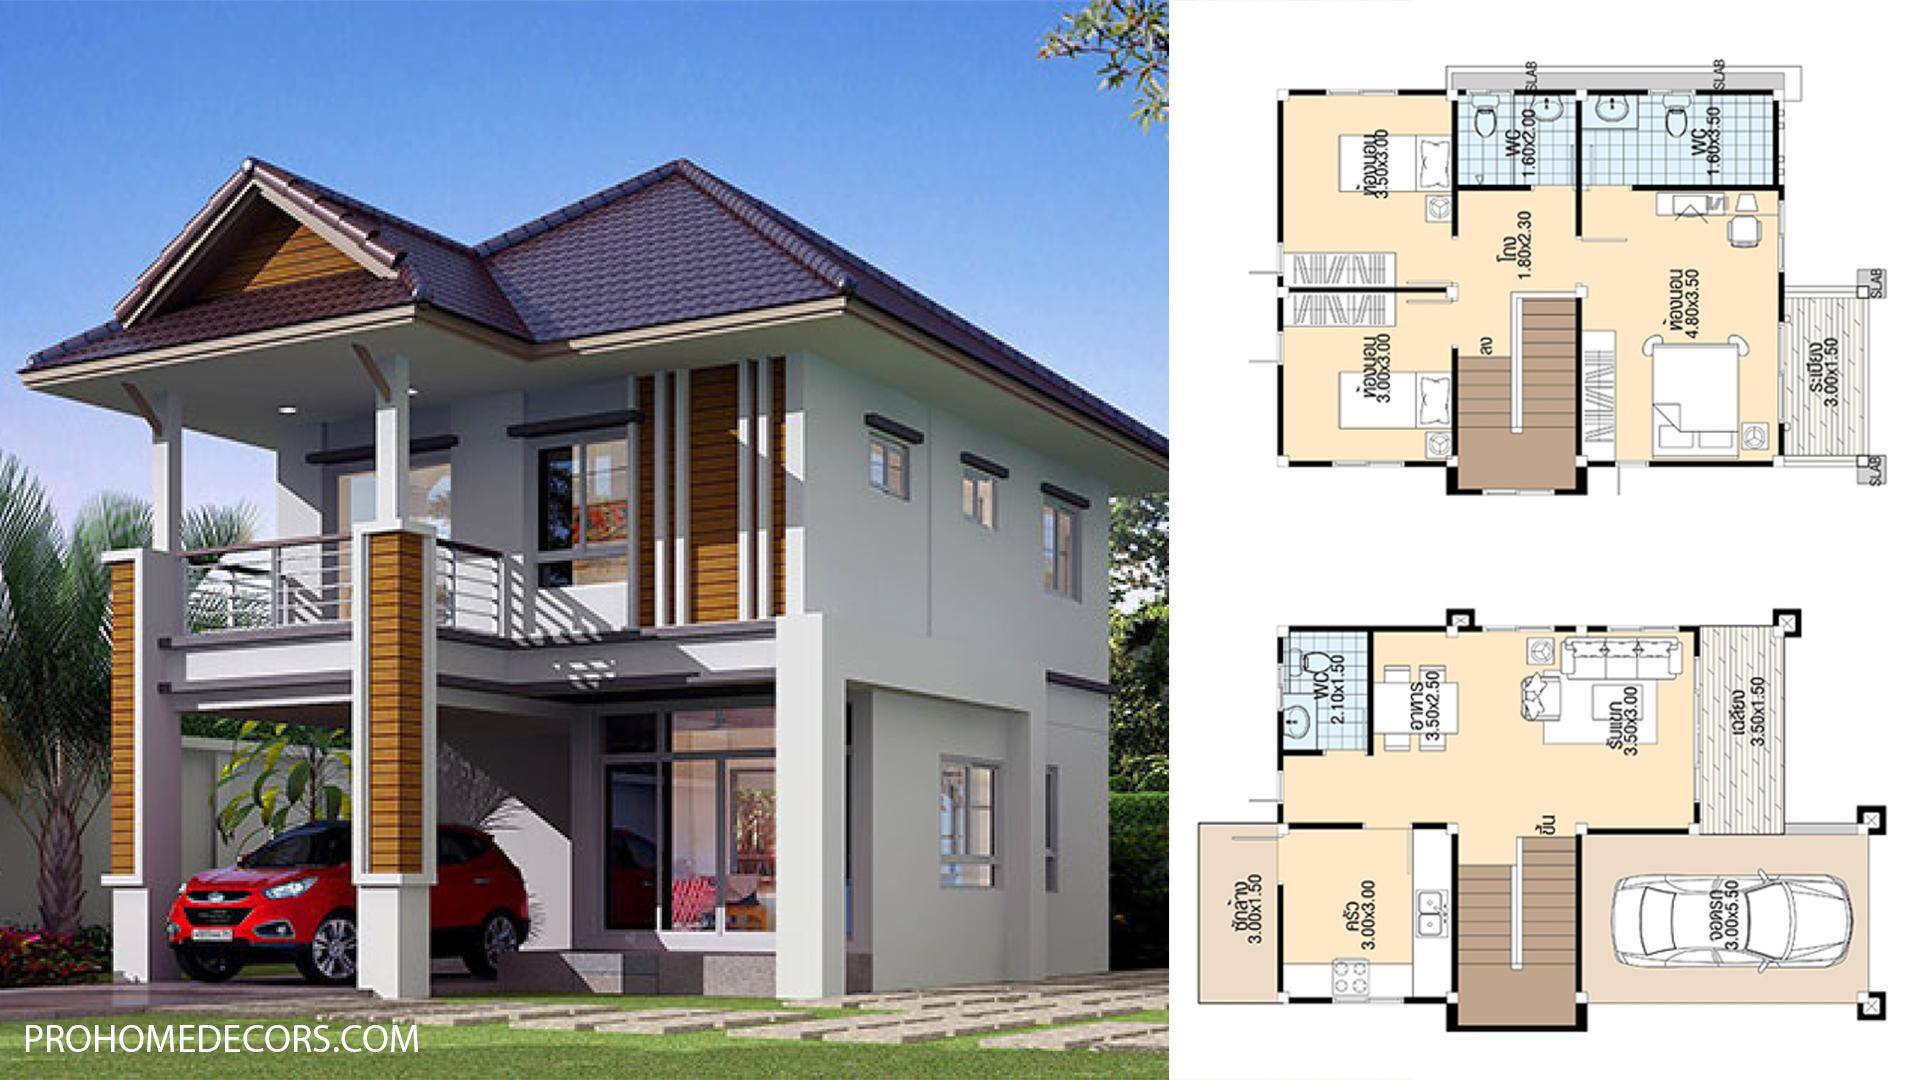 Home Plans 7.5x10 Meter with 3 Bedrooms